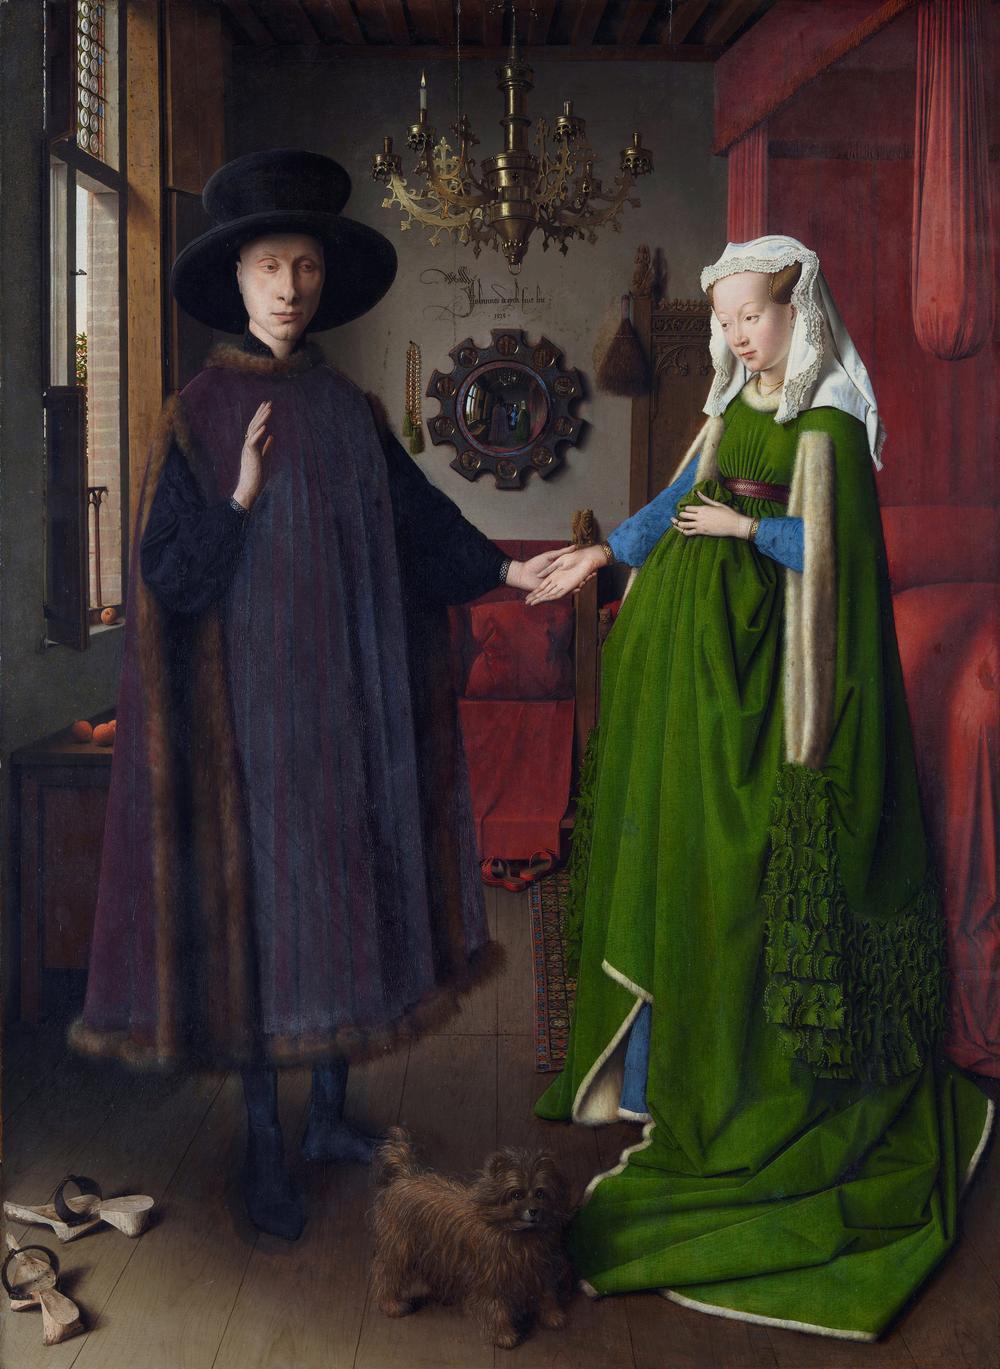 italien datant coutumes du mariage Nina Dobrev et Ian Somerhalder Dating 2013